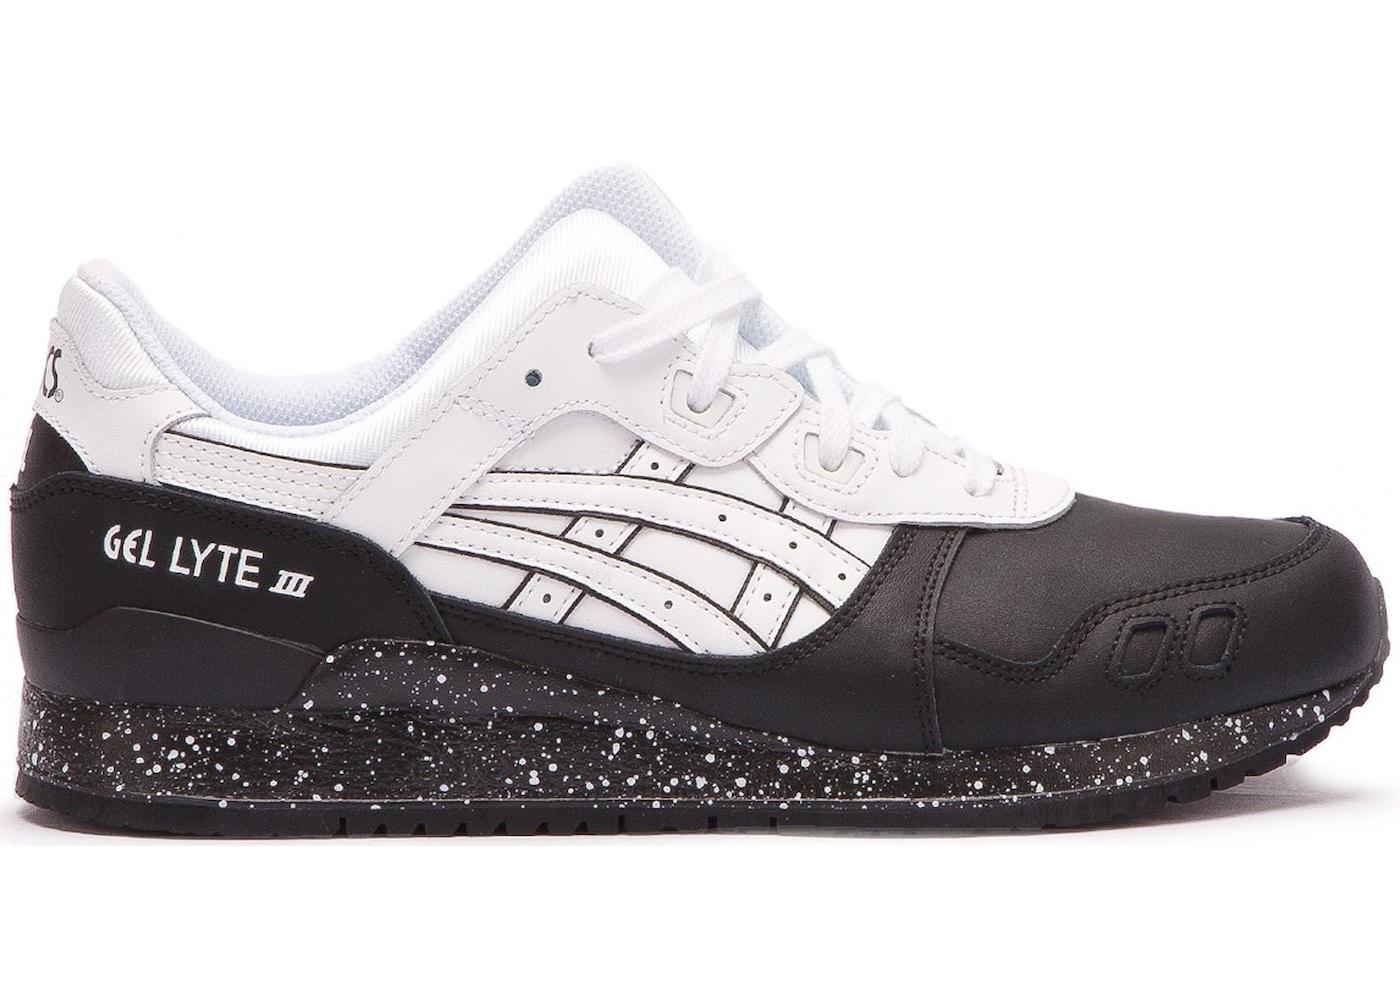 wholesale dealer abc1a 1ba6e Asics Gel-Lyte III Oreo Pack White Black